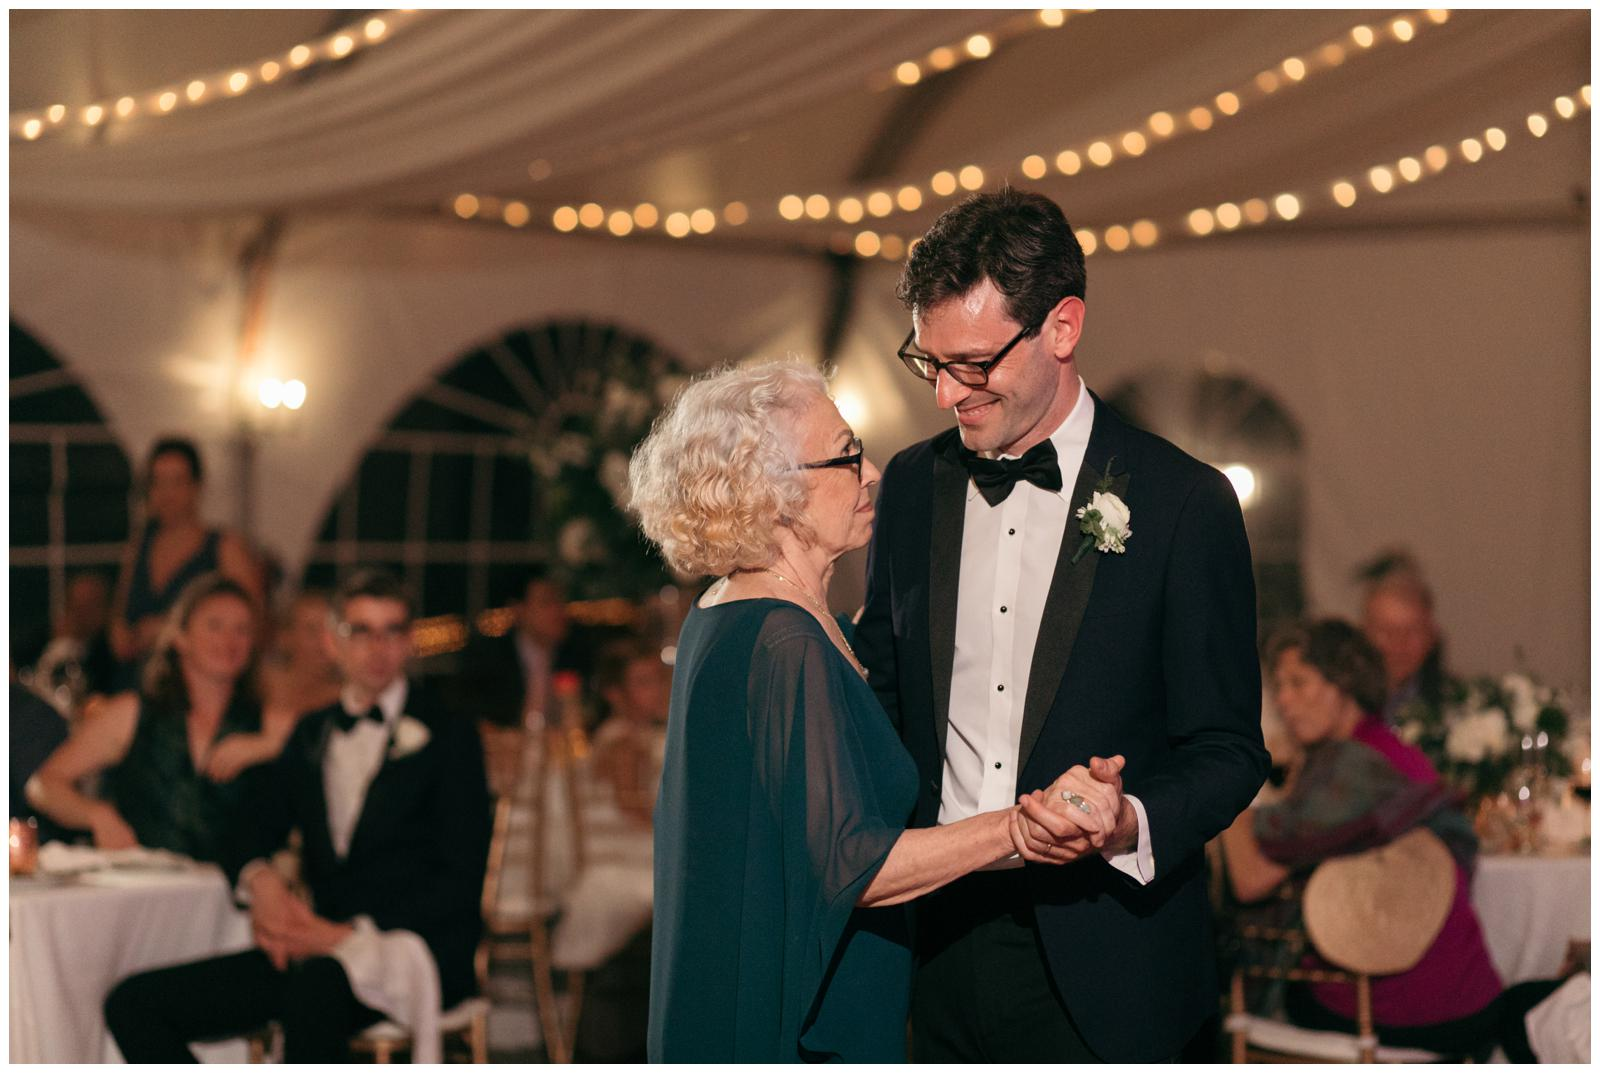 wedding reception in tent Massachusetts